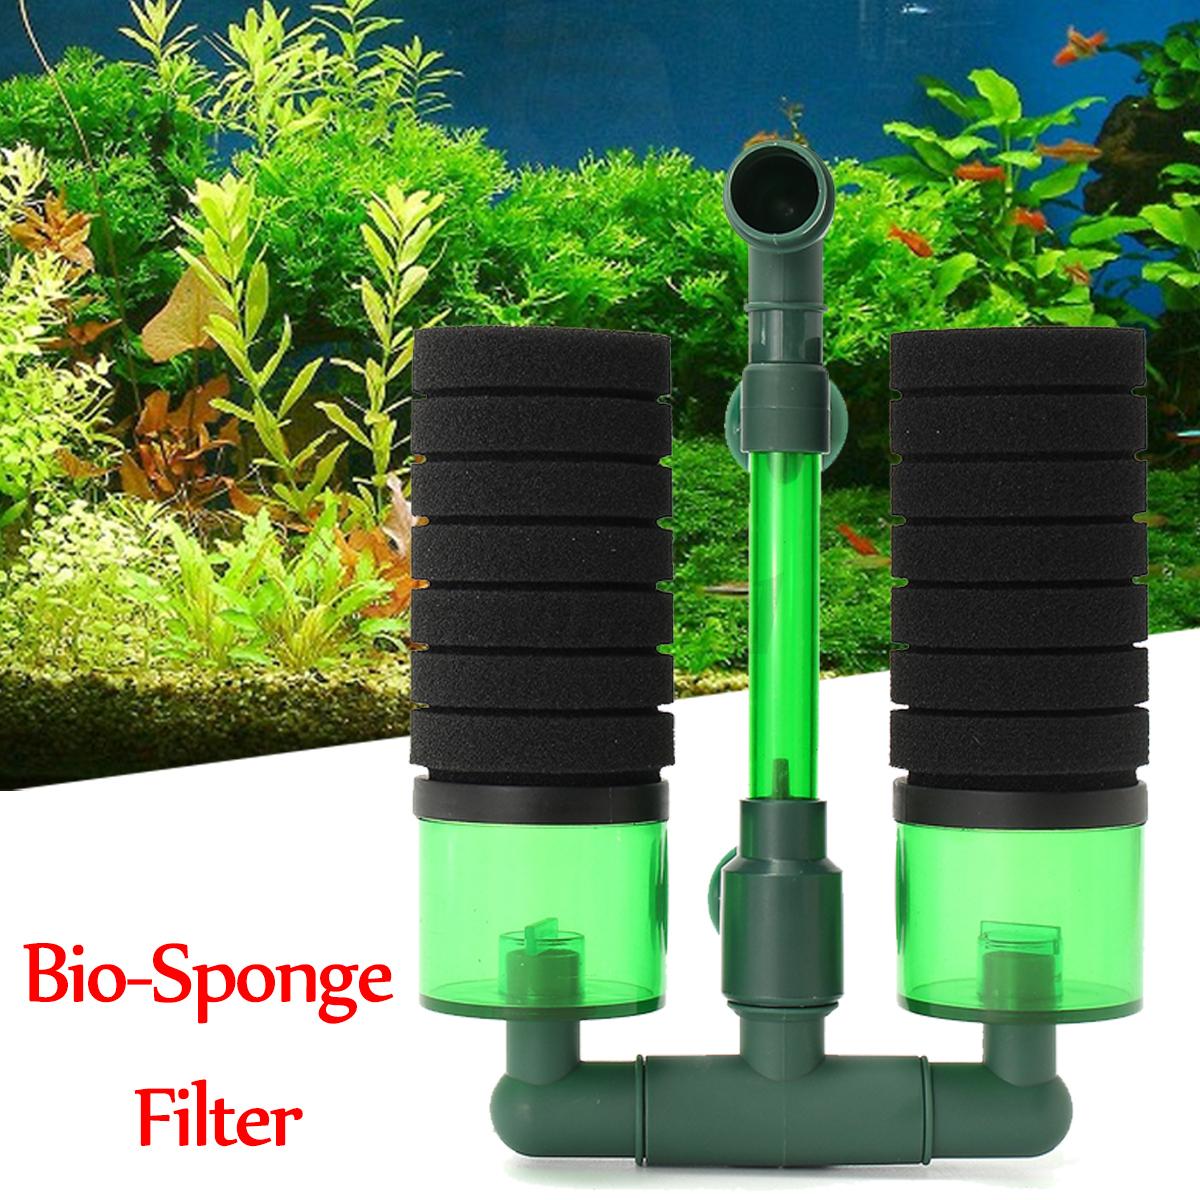 Biochemical Bio Sponge Foam Filter Fry Aquarium Fish Tank